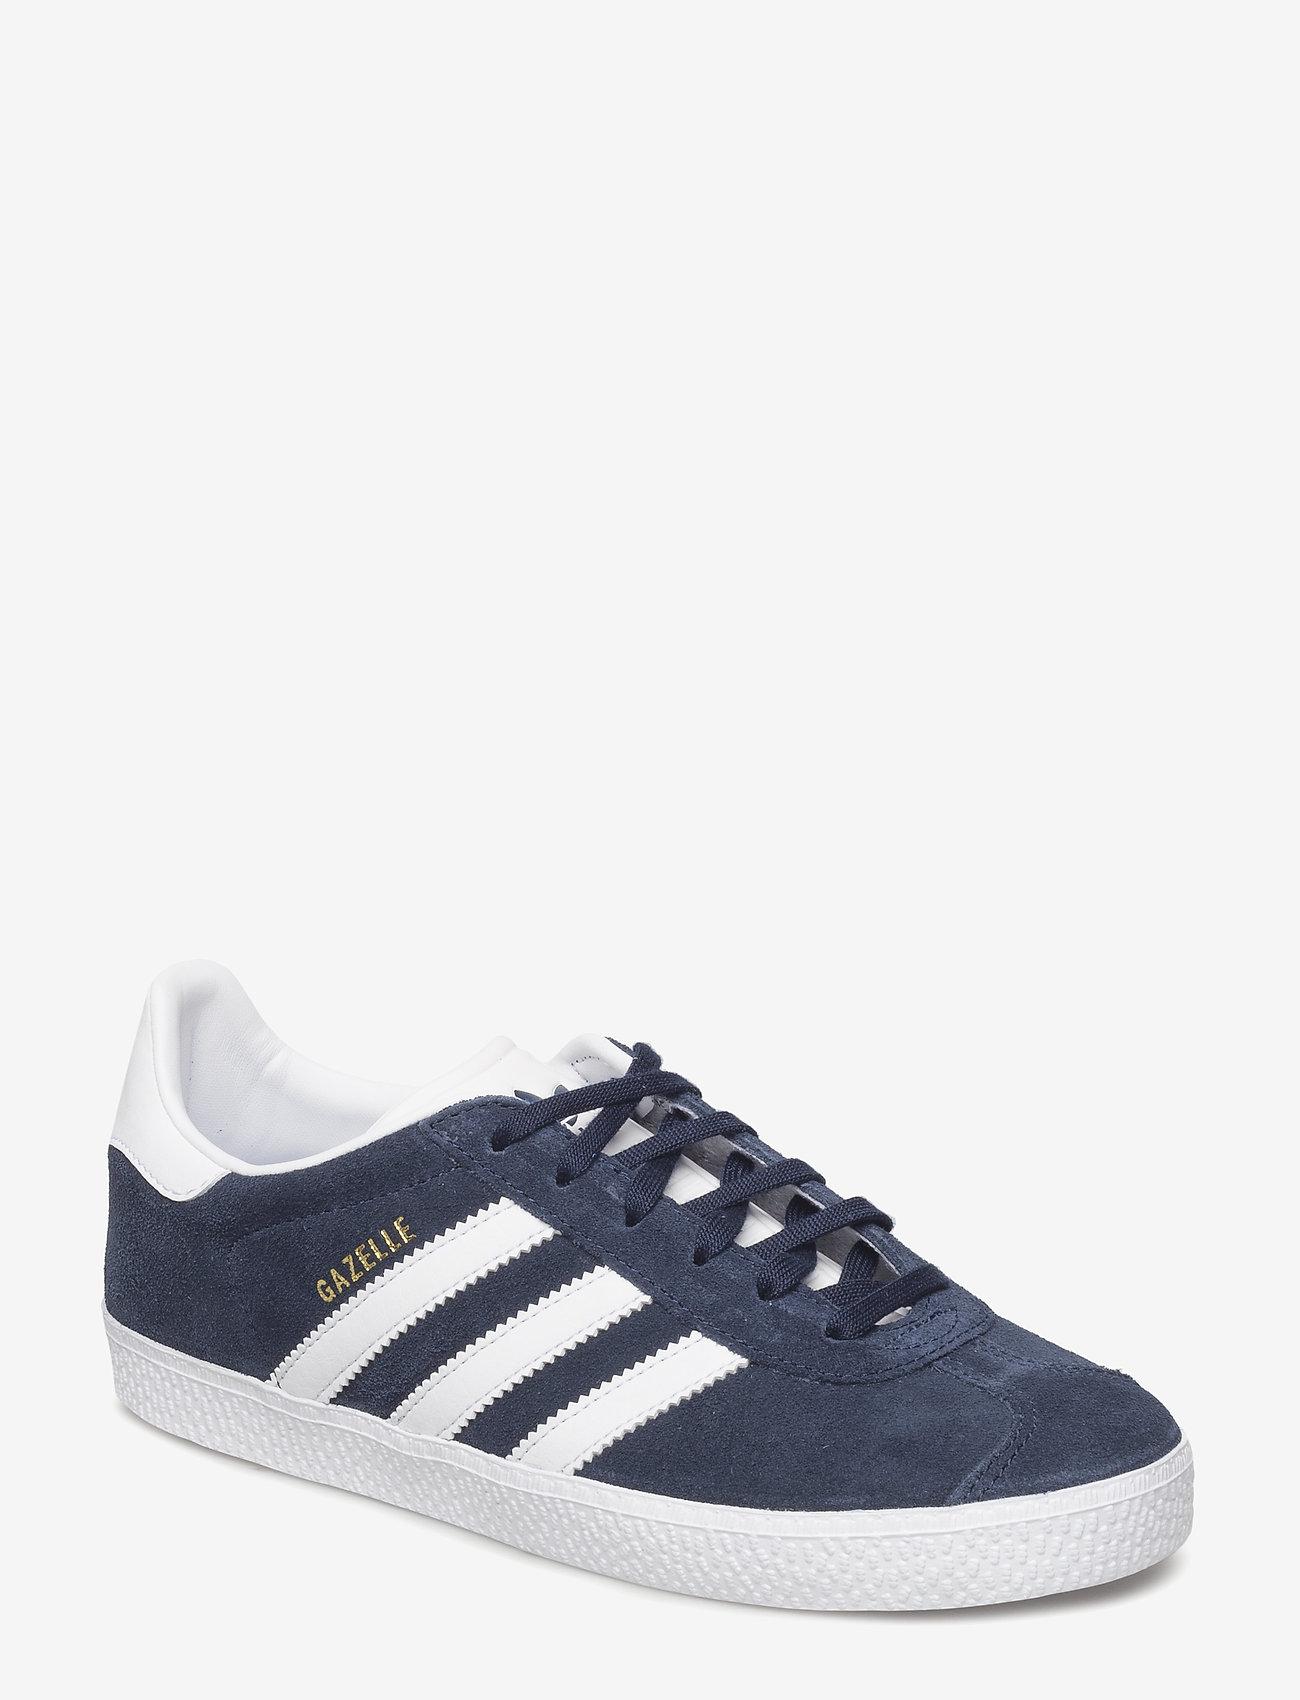 adidas Originals - Gazelle - low tops - conavy/ftwwht/ftwwht - 0